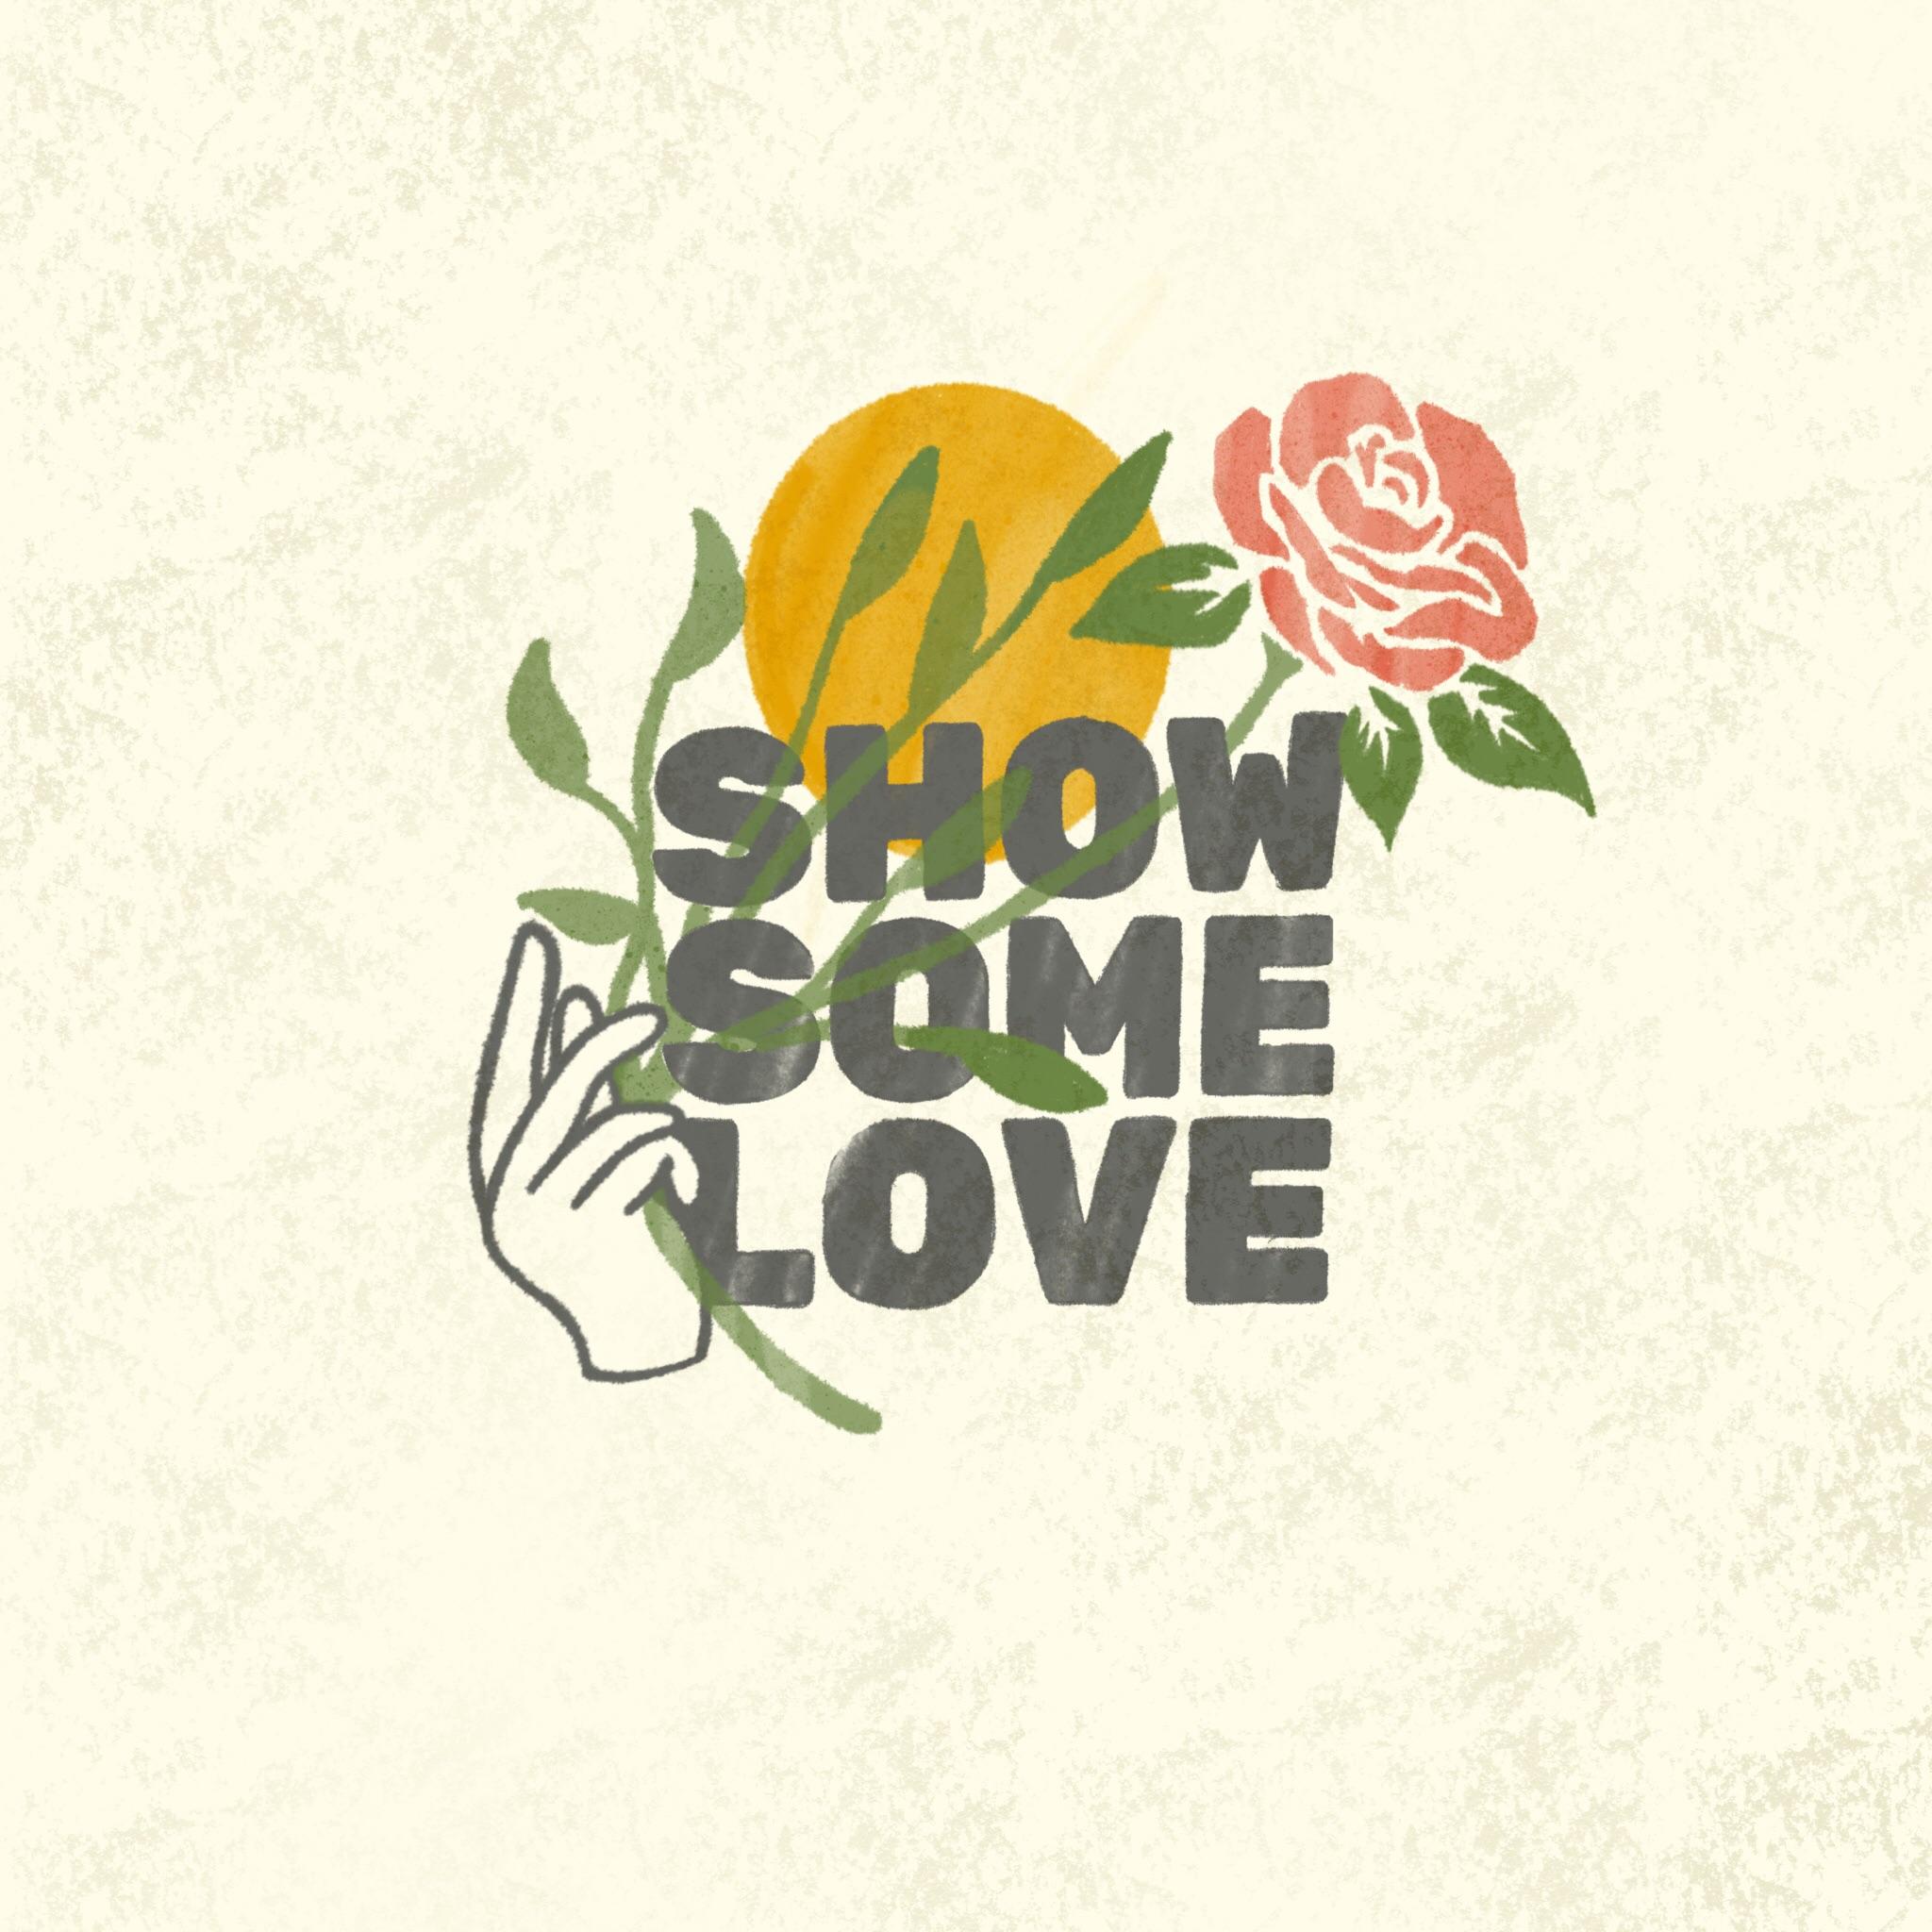 12 Show Some Love.JPG